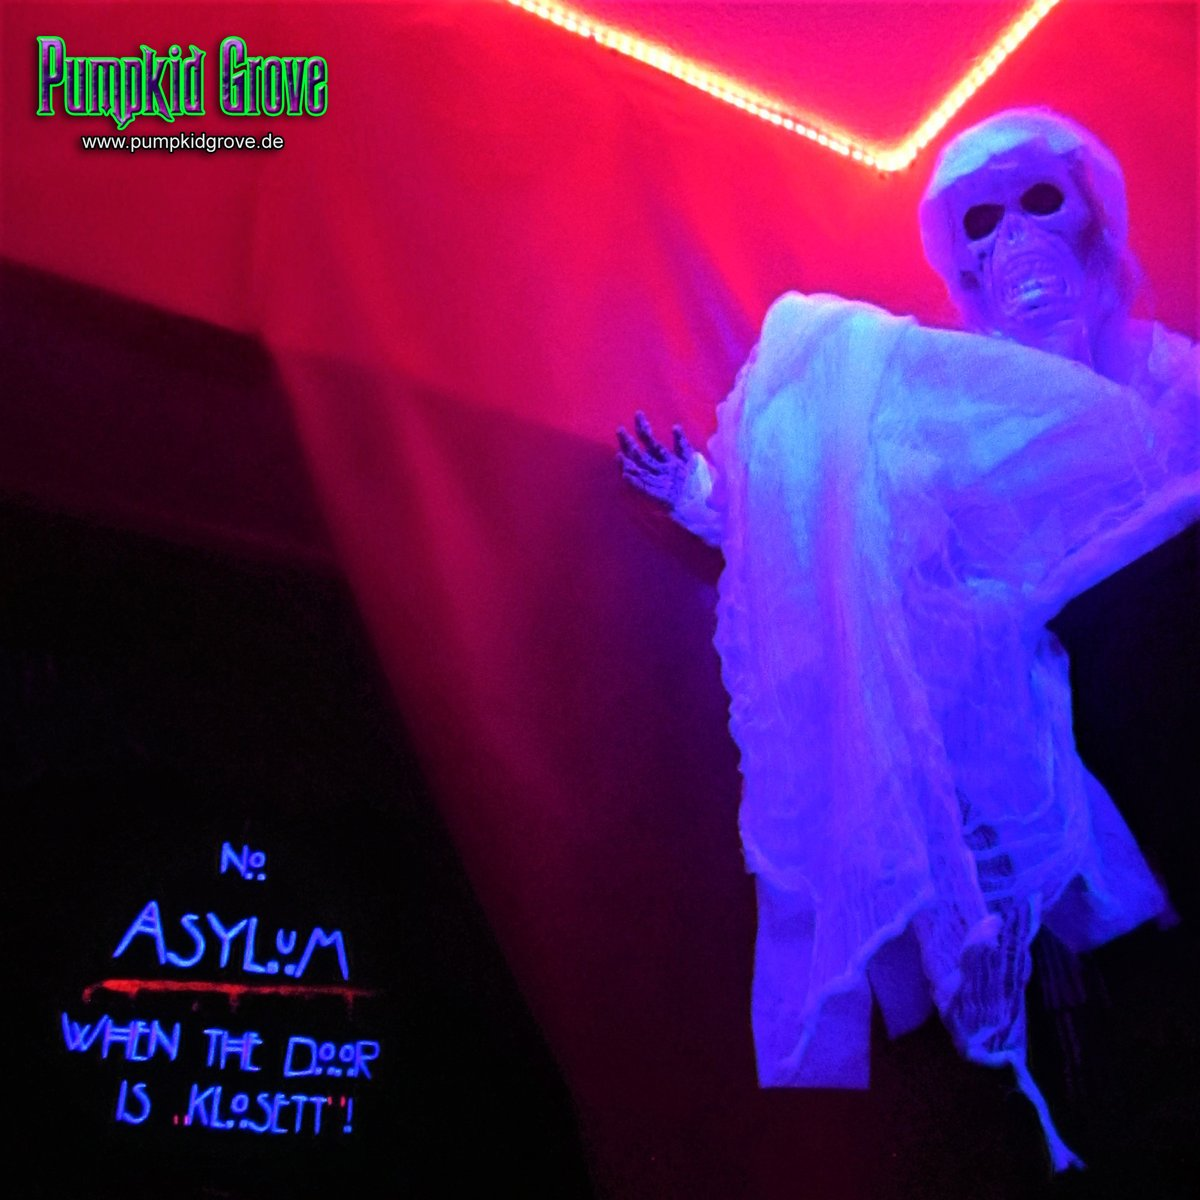 No Asylum When The Door Is Klosett!  #halloween2015 #halloween #samhain #luegburghorrorstory #ahsfx #asylum #geist #ghost #toilette #toilet #gruselig #haunted #horror #homehaunt #love #trickortreat #party #art #halloweendecorations #germany #pumpkidgrove #pumpkidgrovegermany https://t.co/qV10t5QIyO